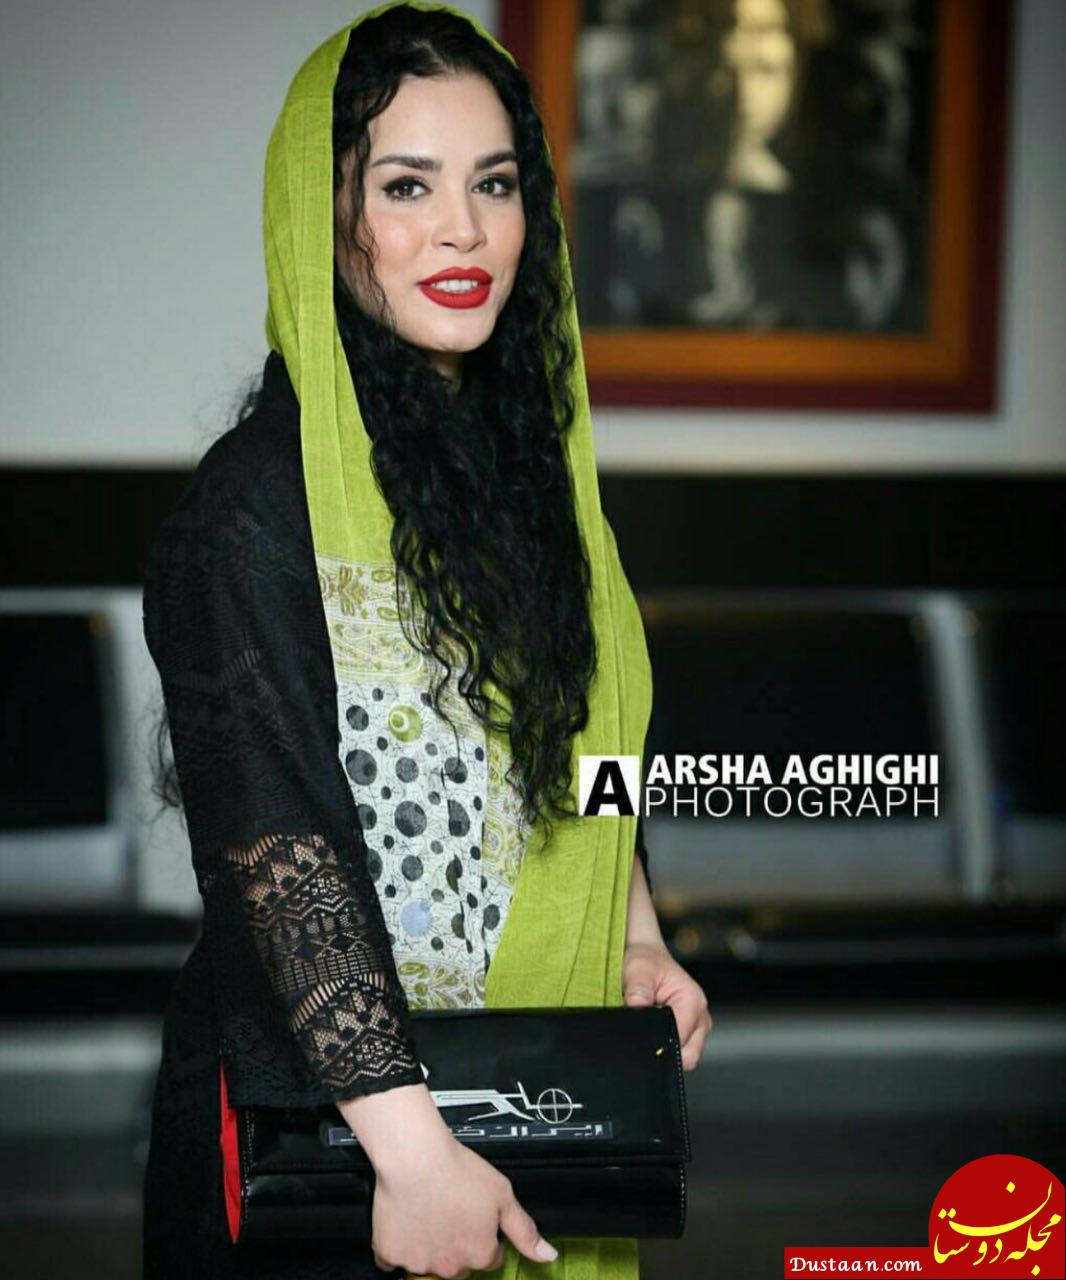 www.dustaan.com ملیکا شریفی نیا در جشن تولد 31 سالگی اش + تصاویر و بیوگرافی